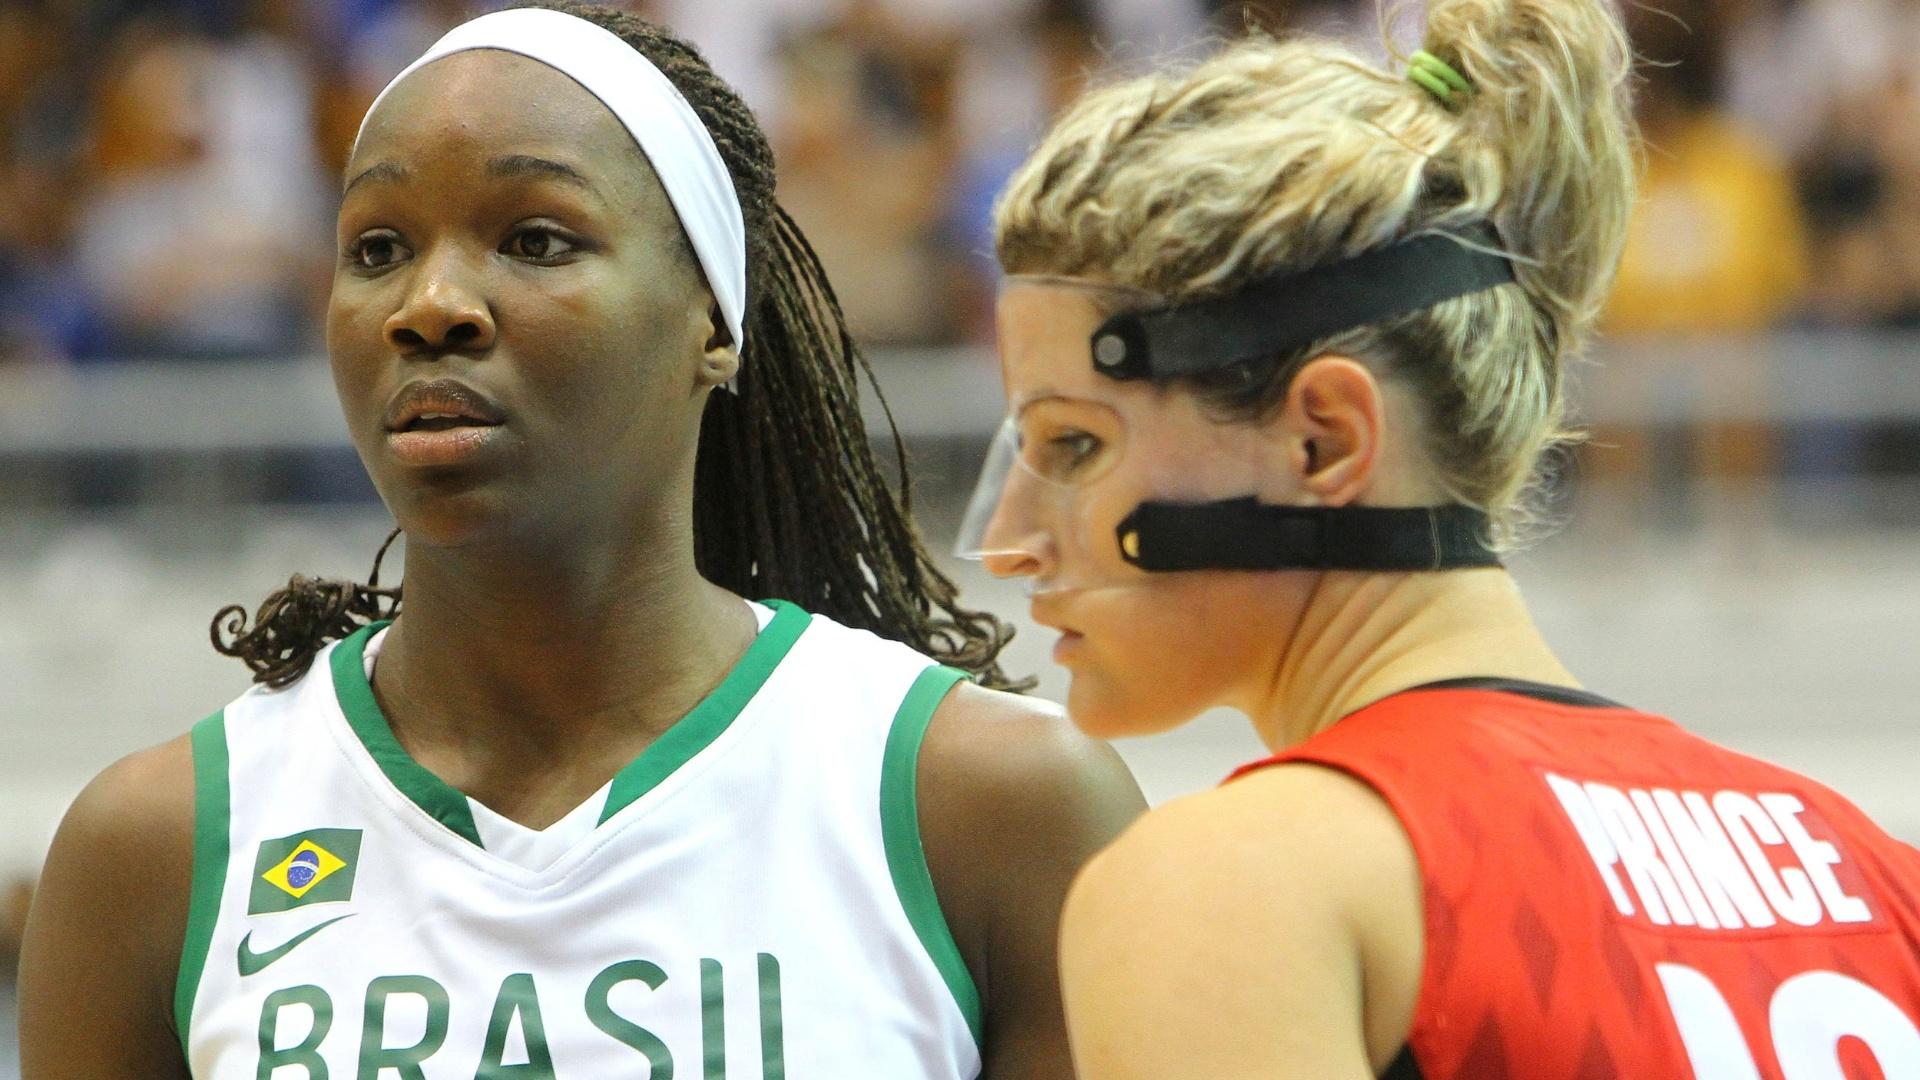 Ao lado de Jaqueline, canadense Raelyn Prince usa máscara ao na partida contra a seleção brasileira feminina de basquete (21/10/2011)